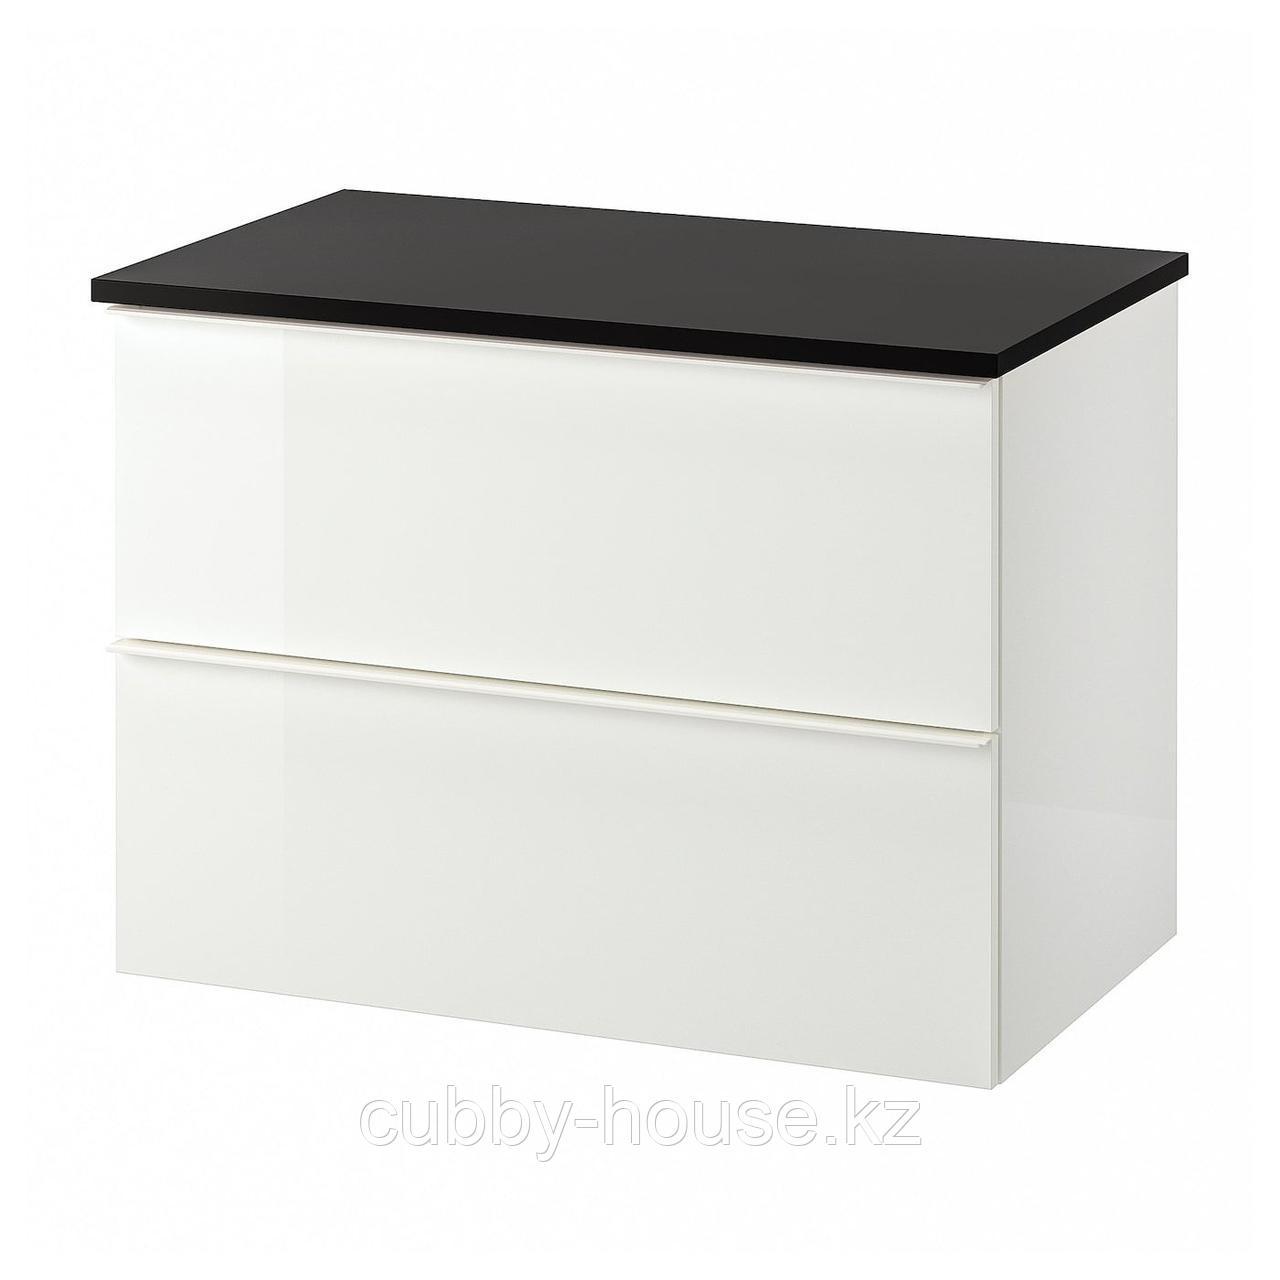 ГОДМОРГОН / ТОЛКЕН Шкаф для раковины с 2 ящ, глянцевый белый, под мрамор, 82x49x60 см